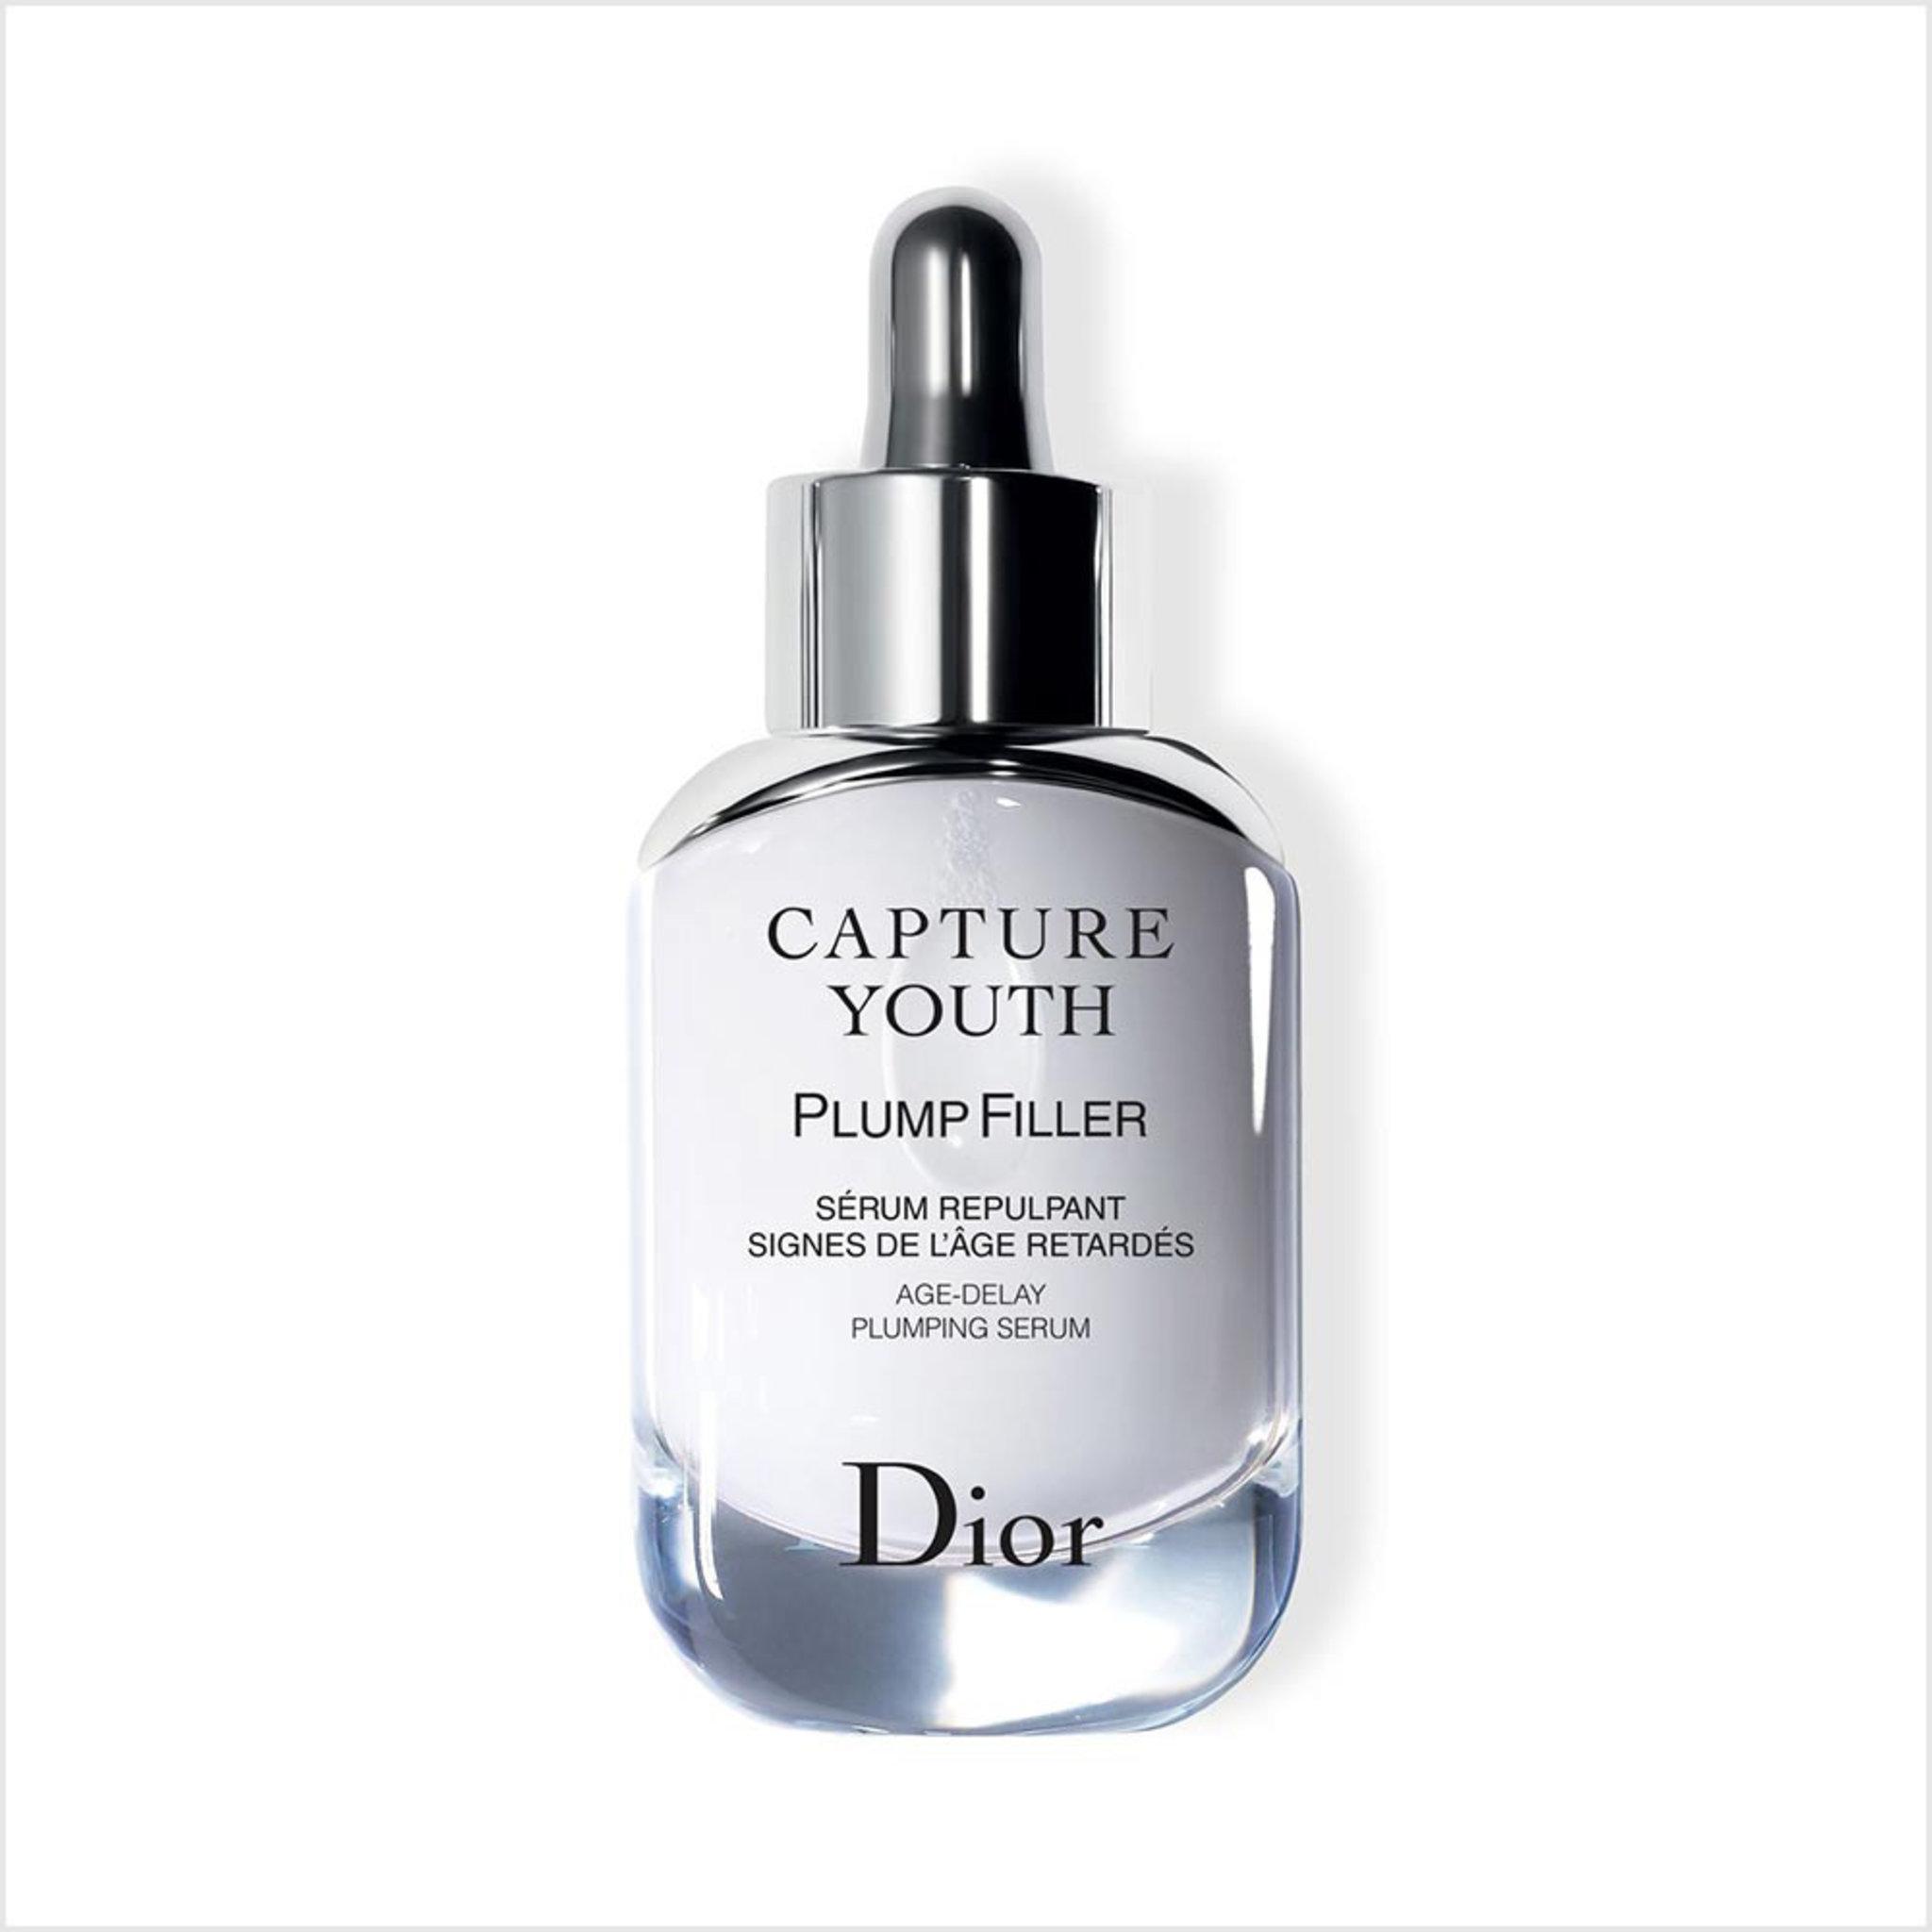 Capture Youth Plump Filler Serum, 30 ML